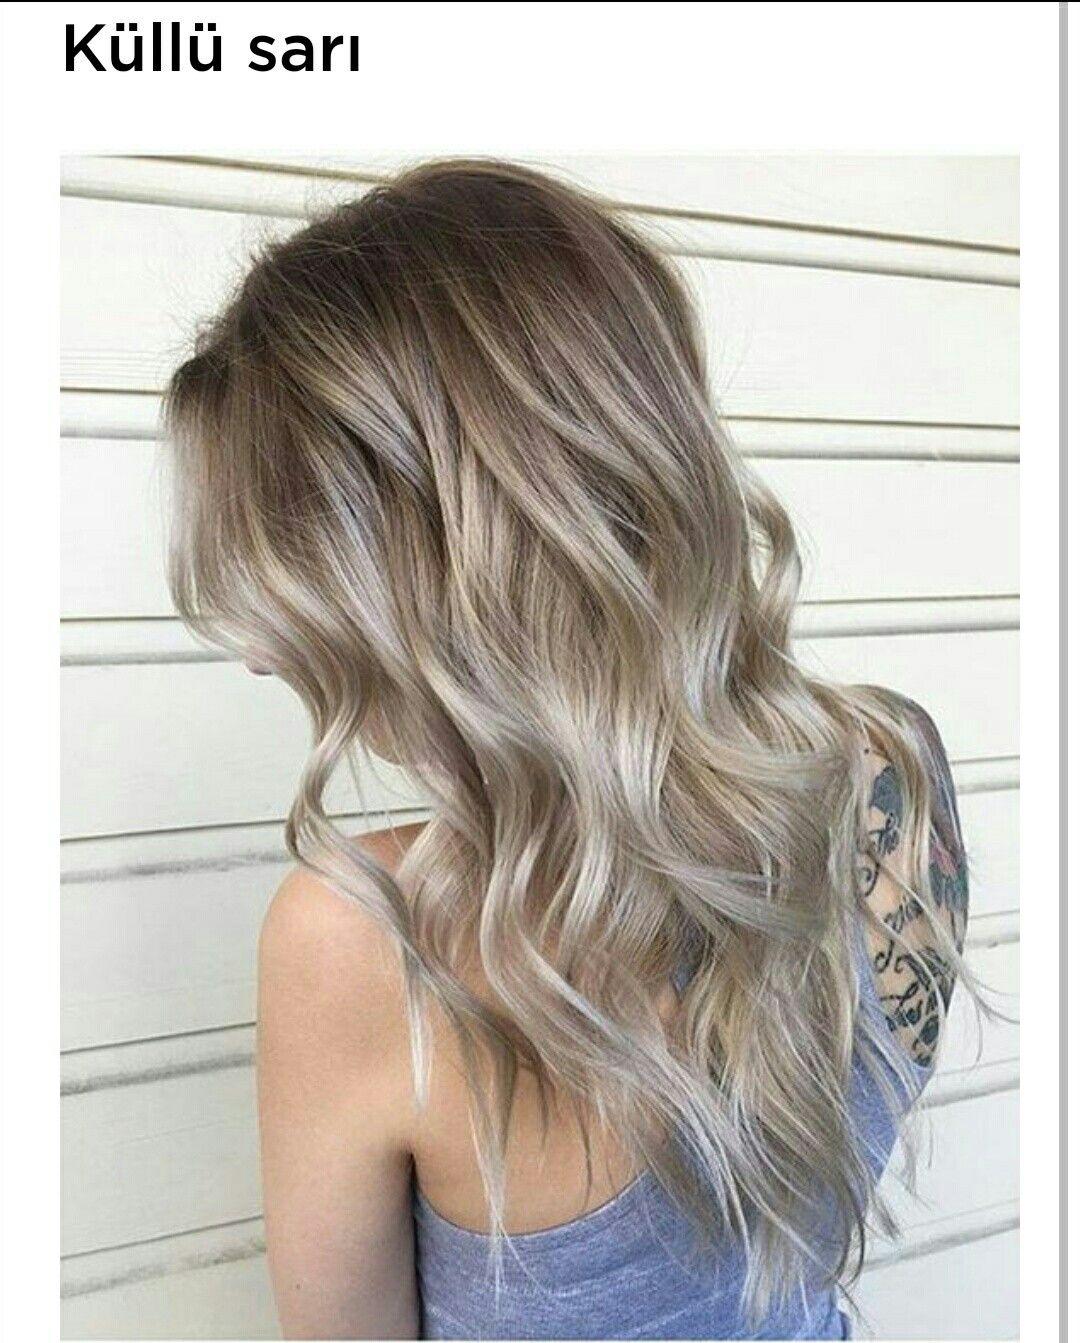 Blondhair Blond Hair Kullu Sari Balyaj Sac Sarisin Renkli Sari